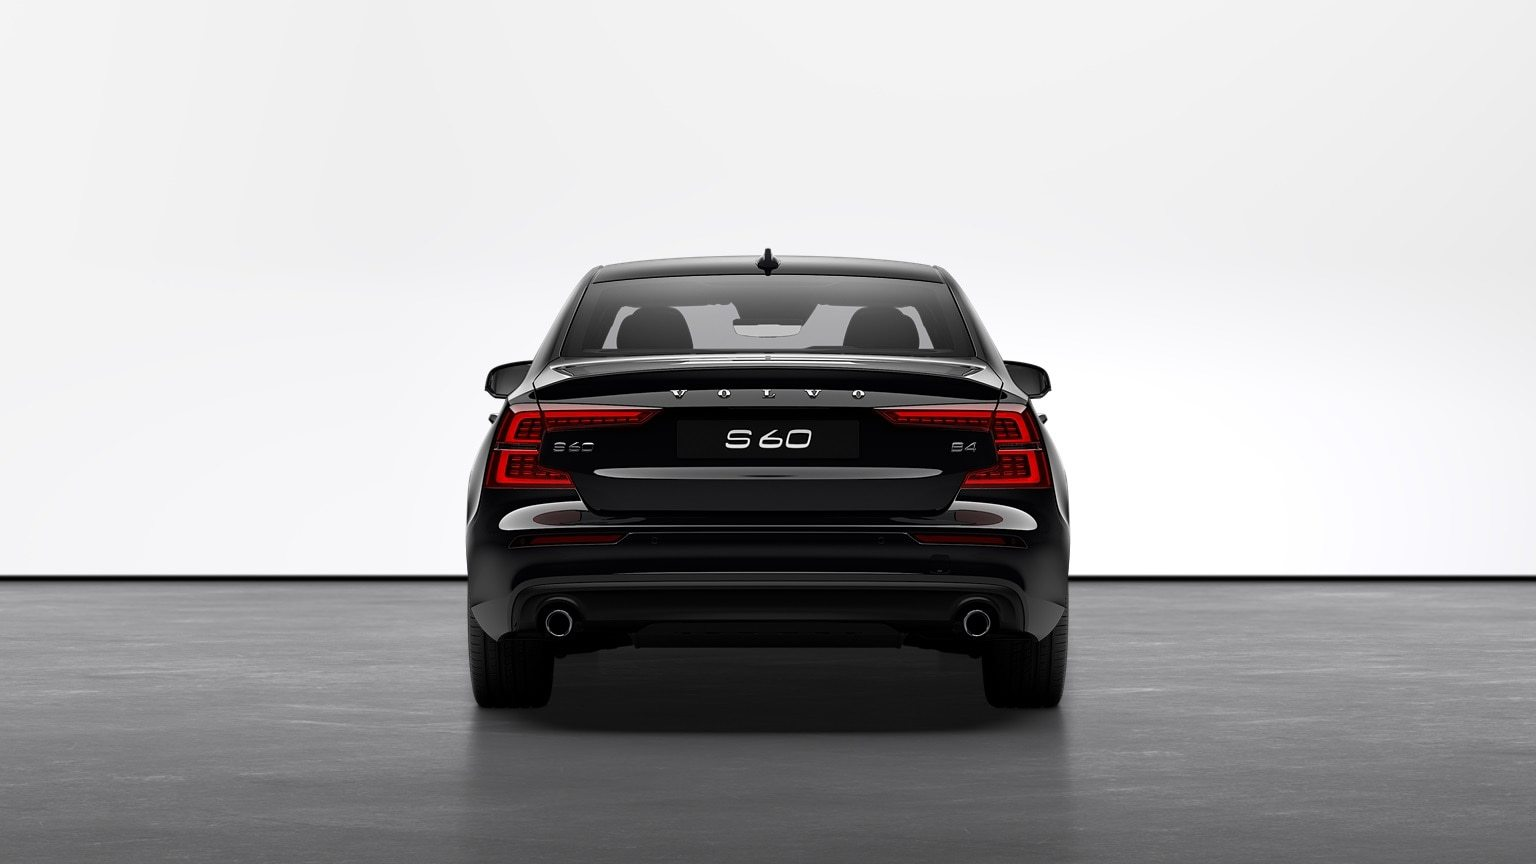 Volvo S60 Premium Edition Oferta Enero 2021 05